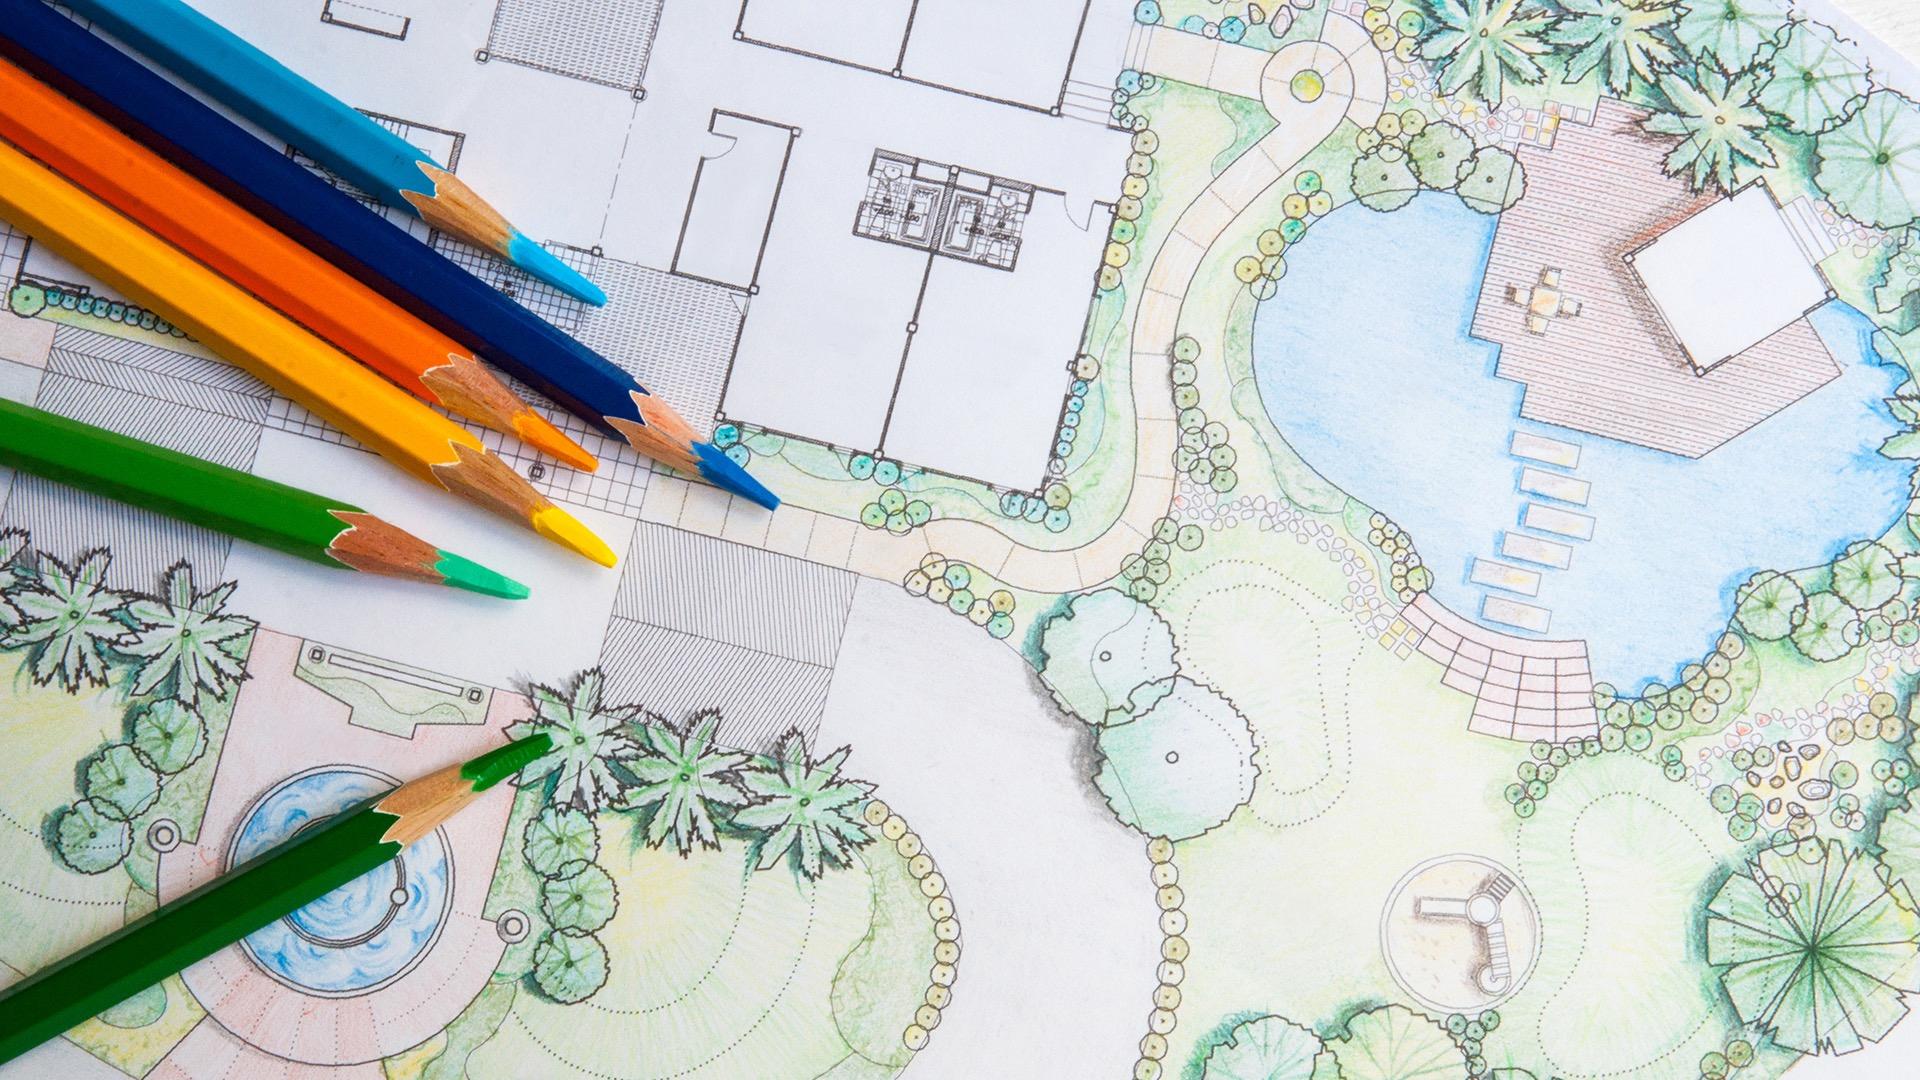 Design services by EcoLawn Santa Barbara